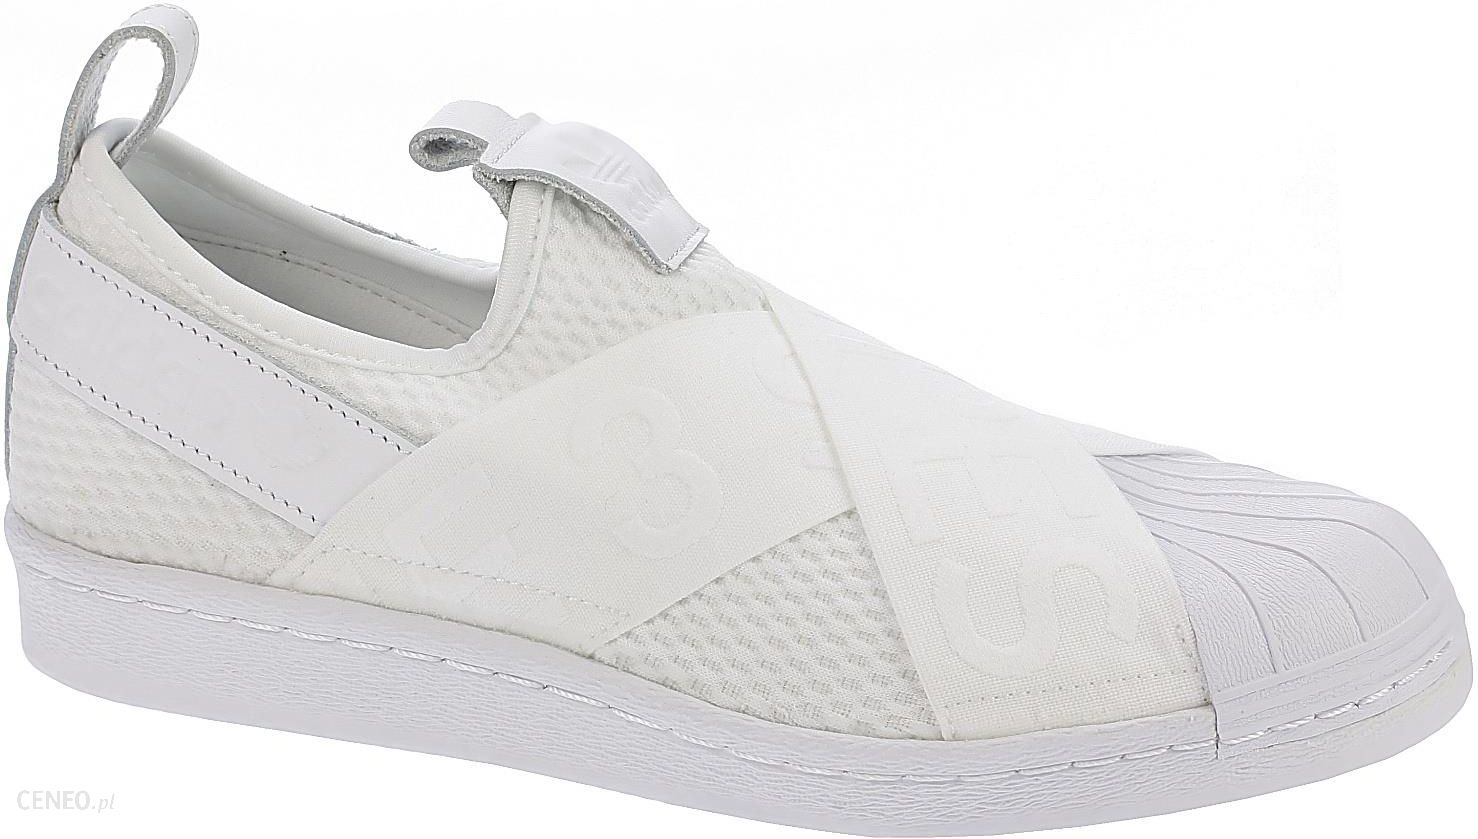 buty adidas Originals Superstar Slip On WhiteWhiteCore Black 40 23